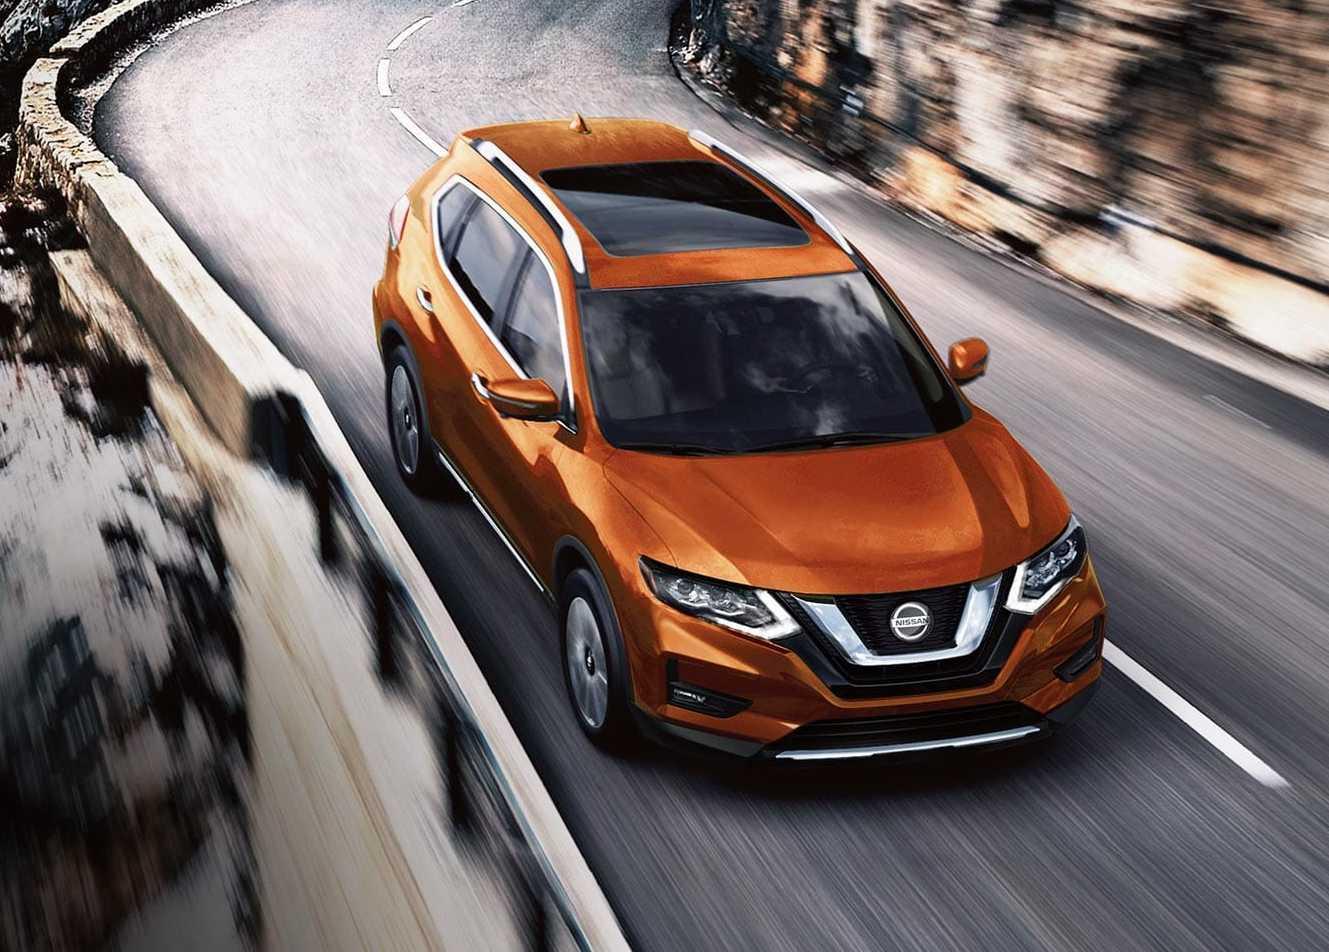 2020 Nissan Rogue for Sale near Hicksville, NY